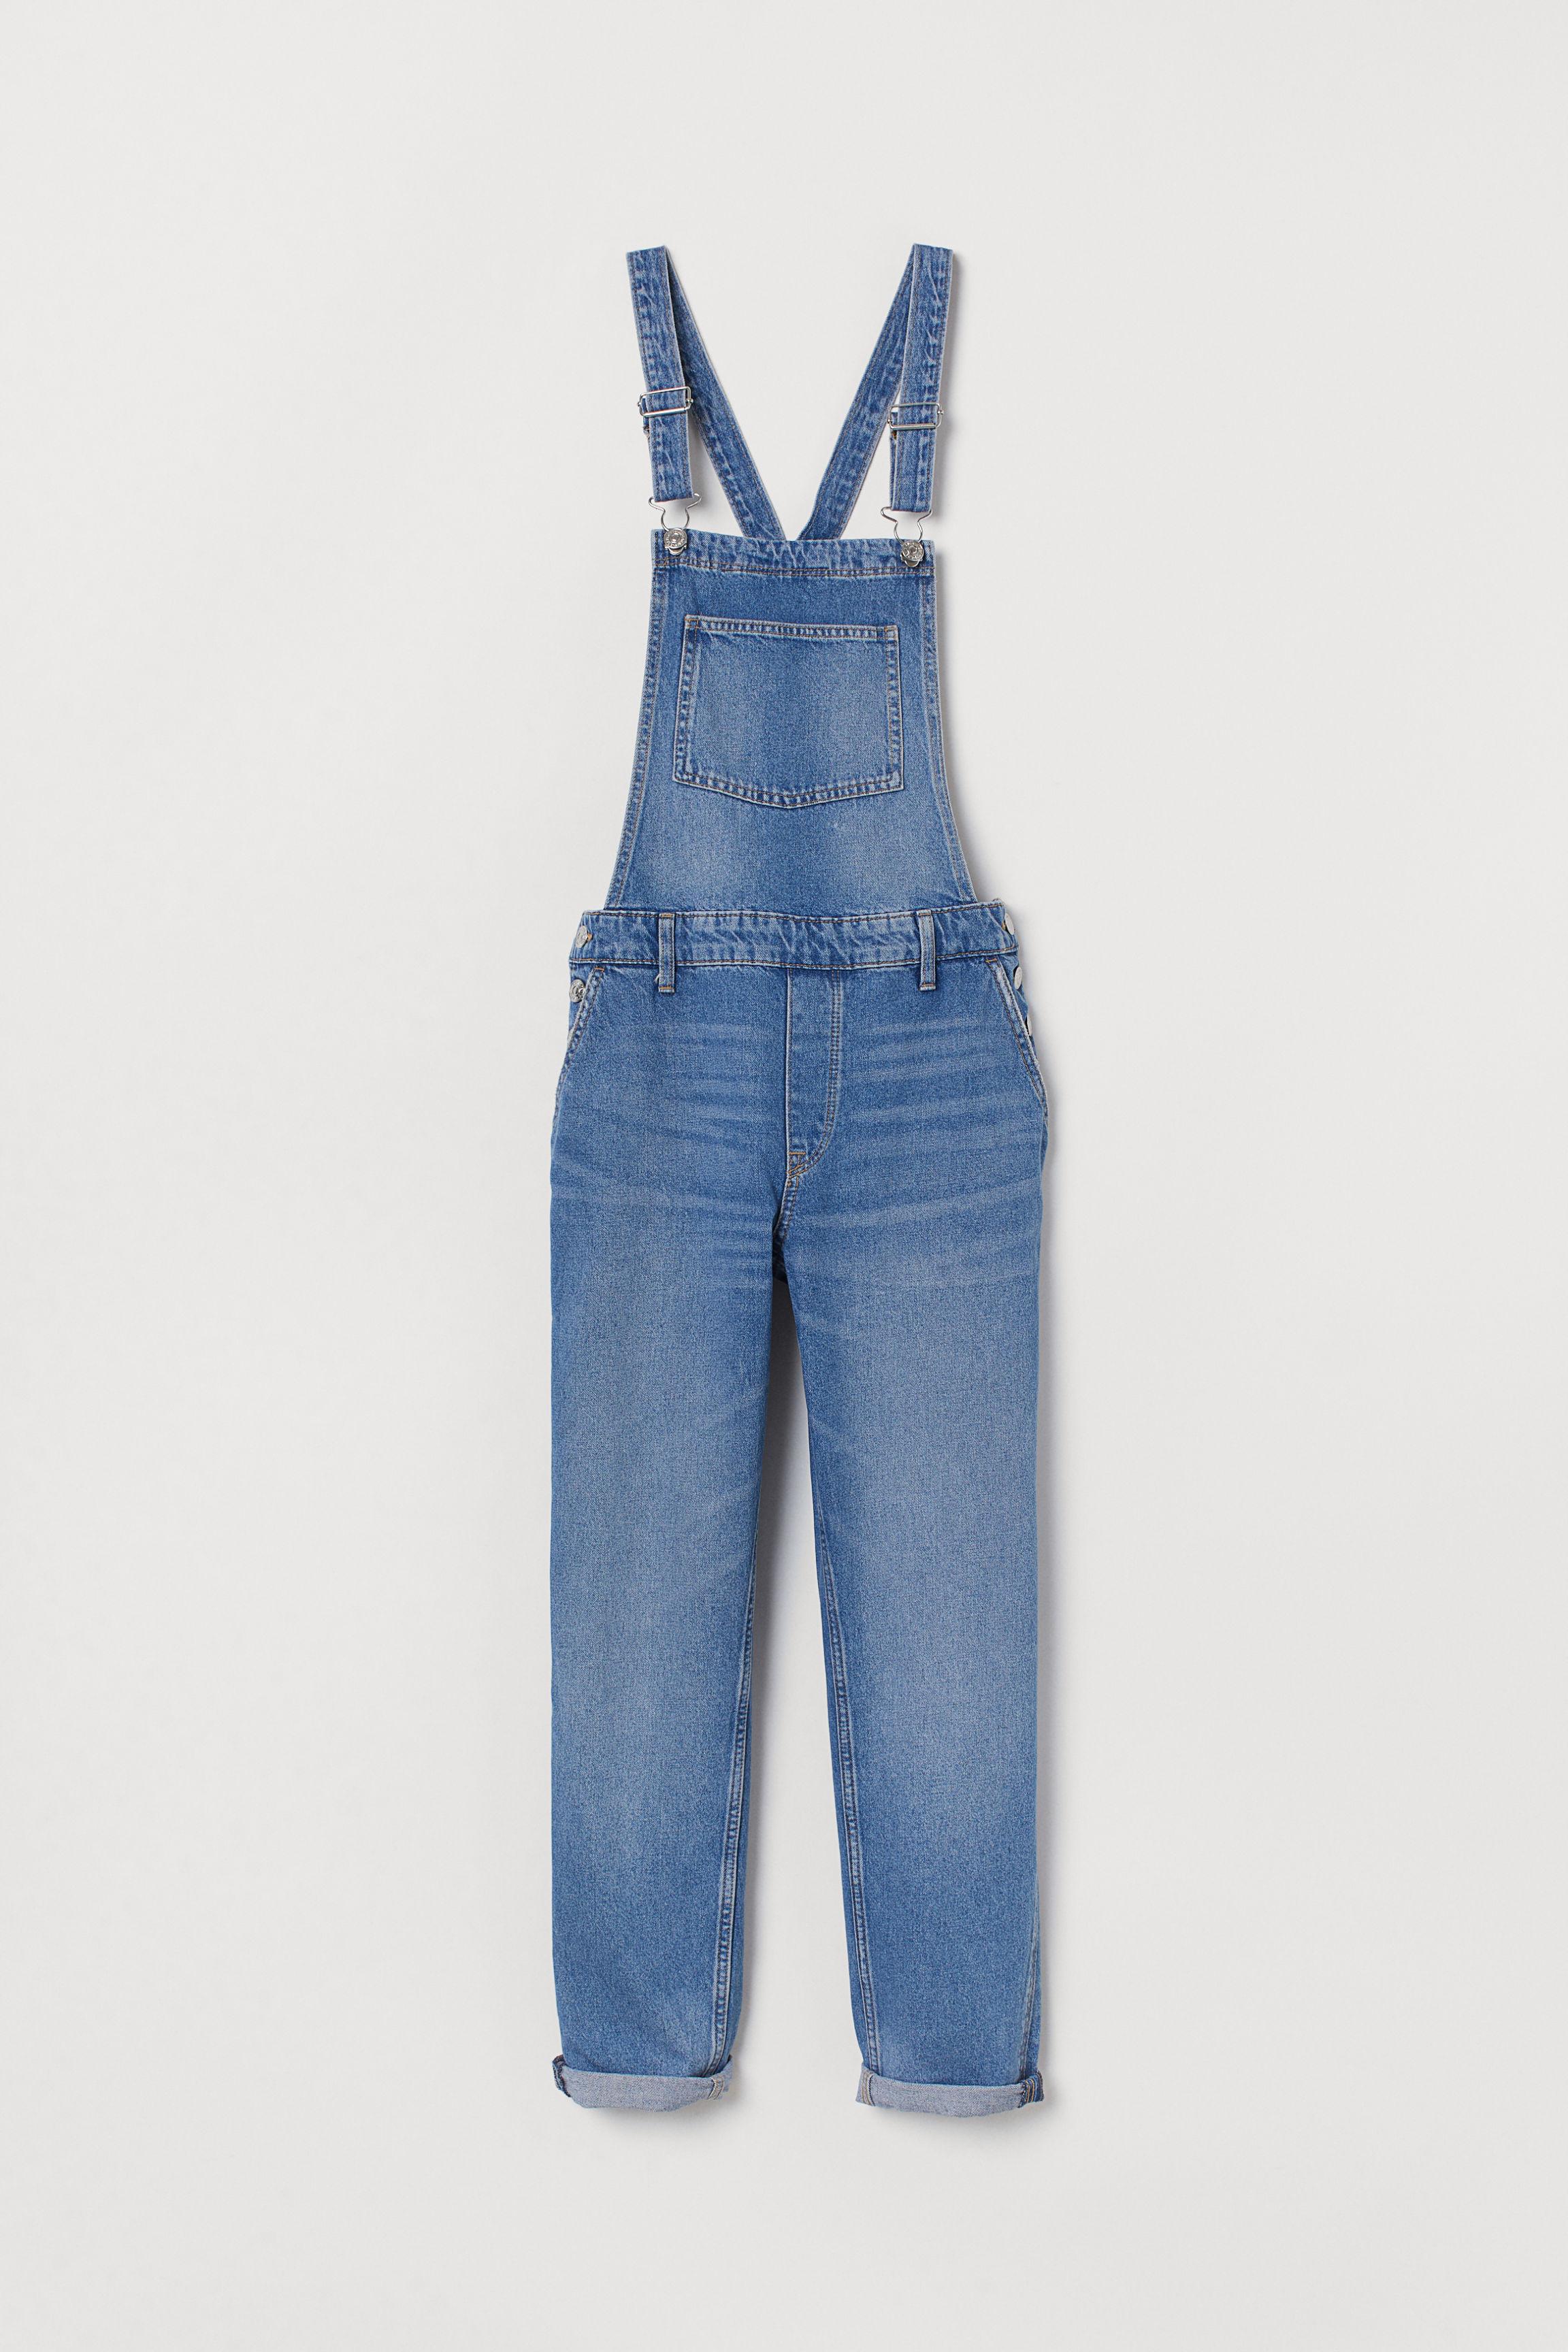 67d3d6e171 Denim Bib Overalls - Light denim blue - Ladies